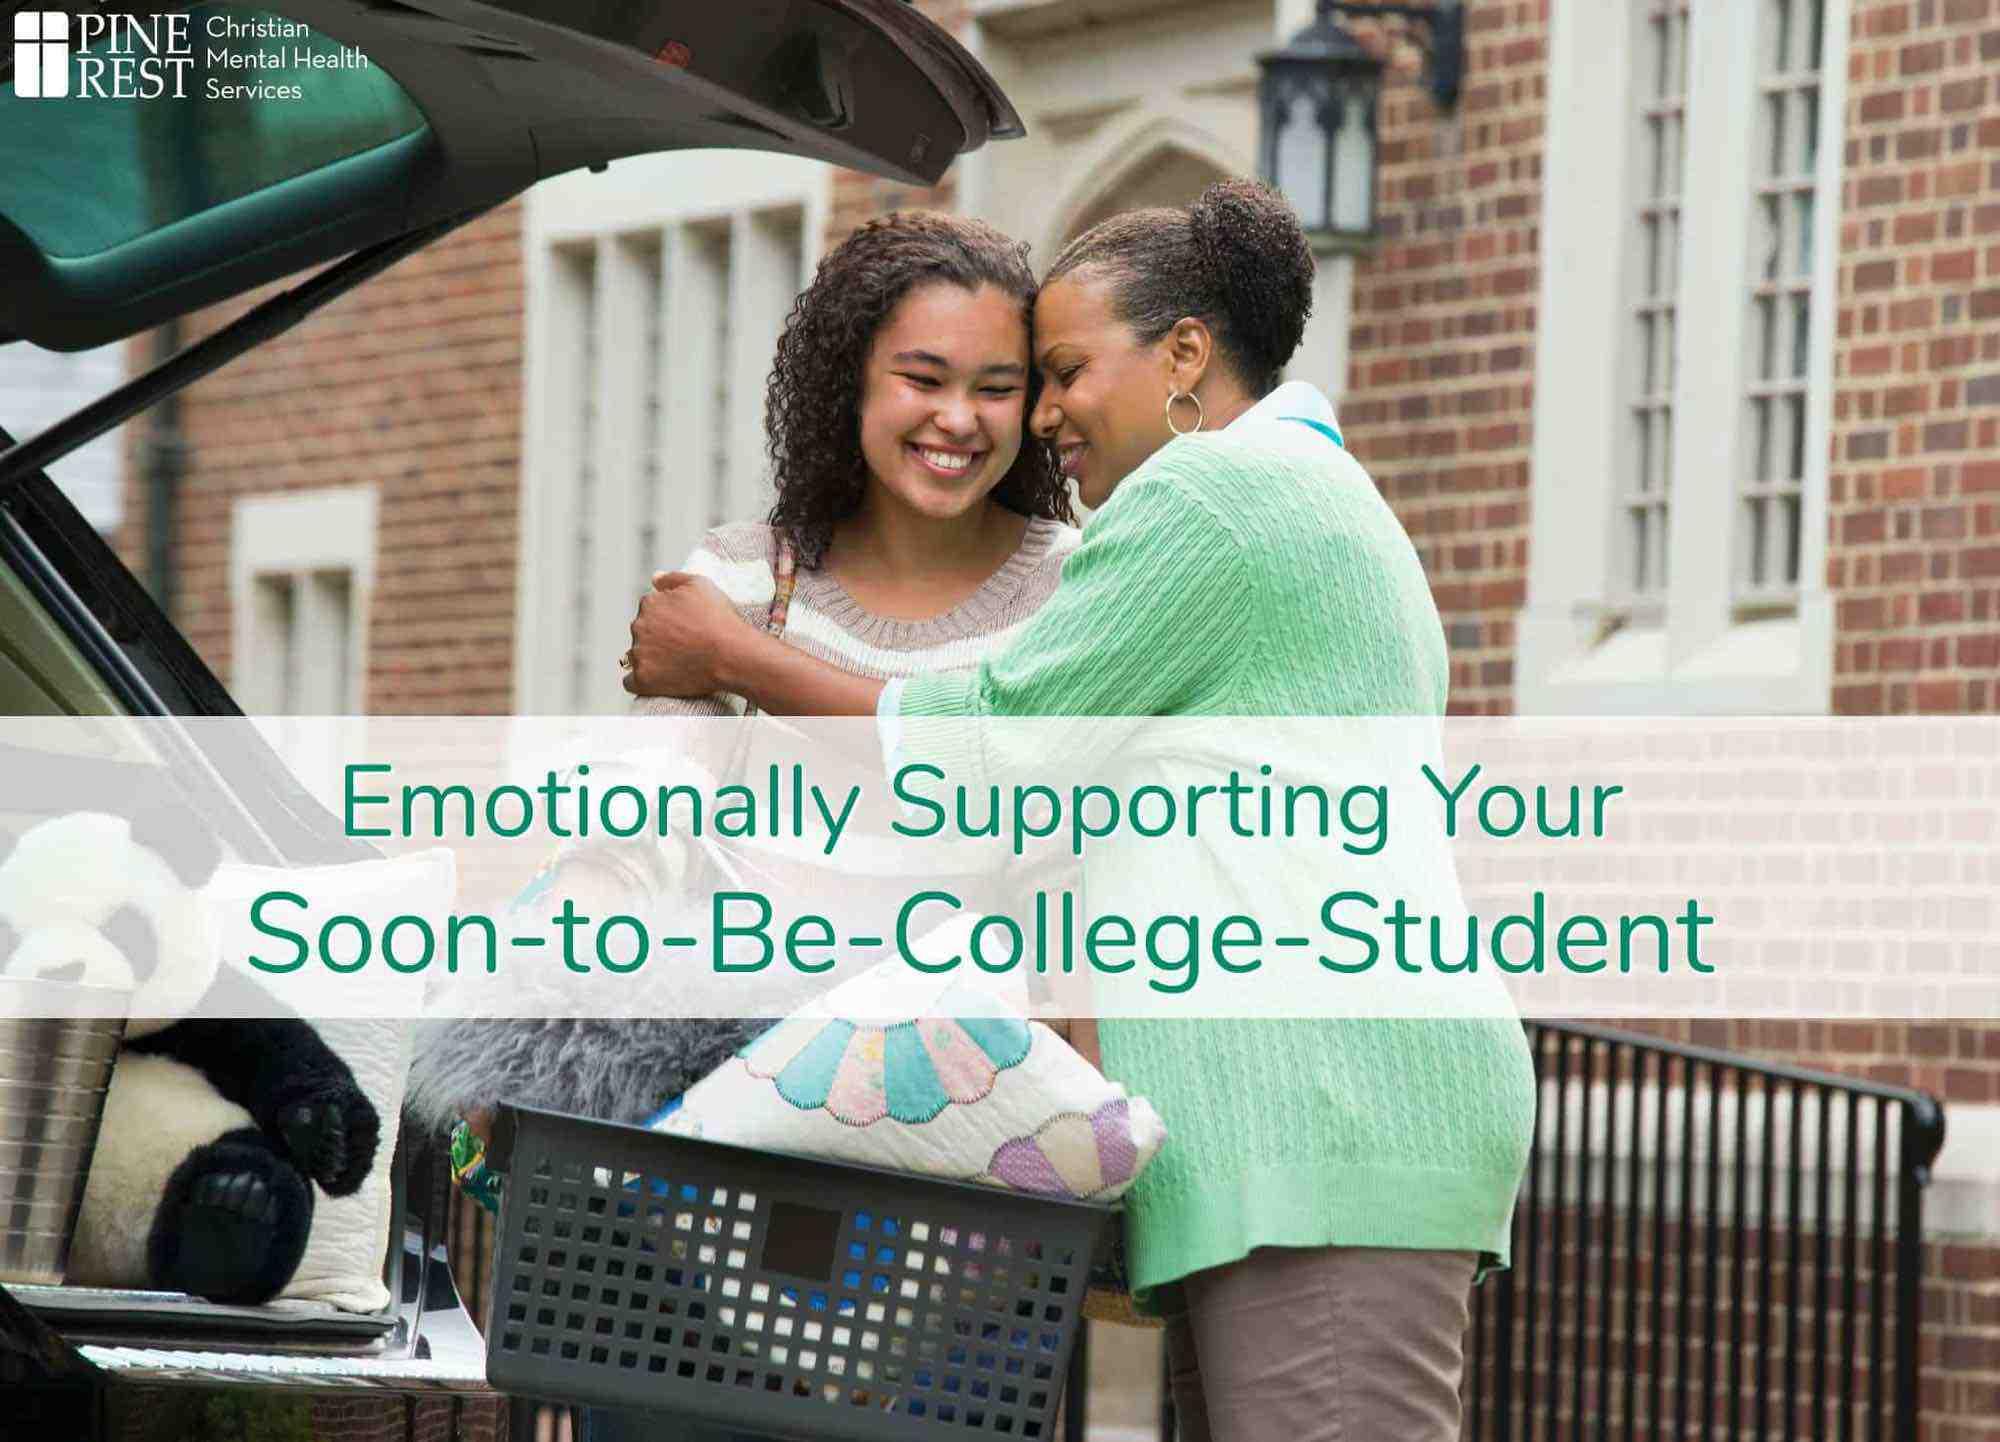 Mom hugging daughter at college drop off